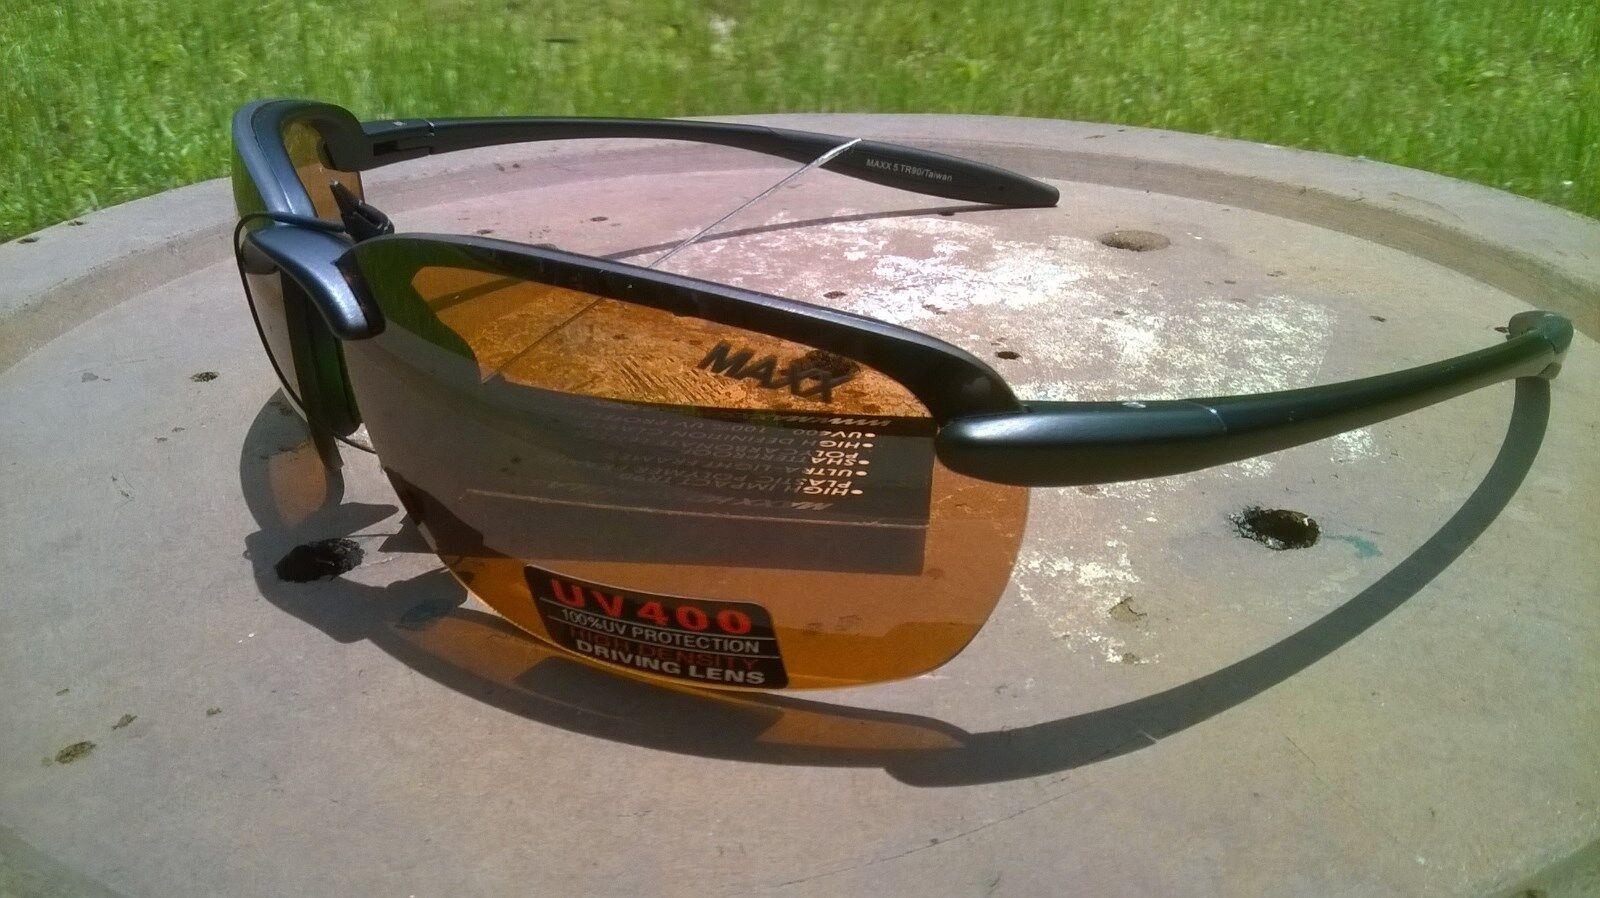 8b8082e48bd29 2017 Maxx Sunglasses Maxx 5 Black Frame Tr90 HD Amber Lenses